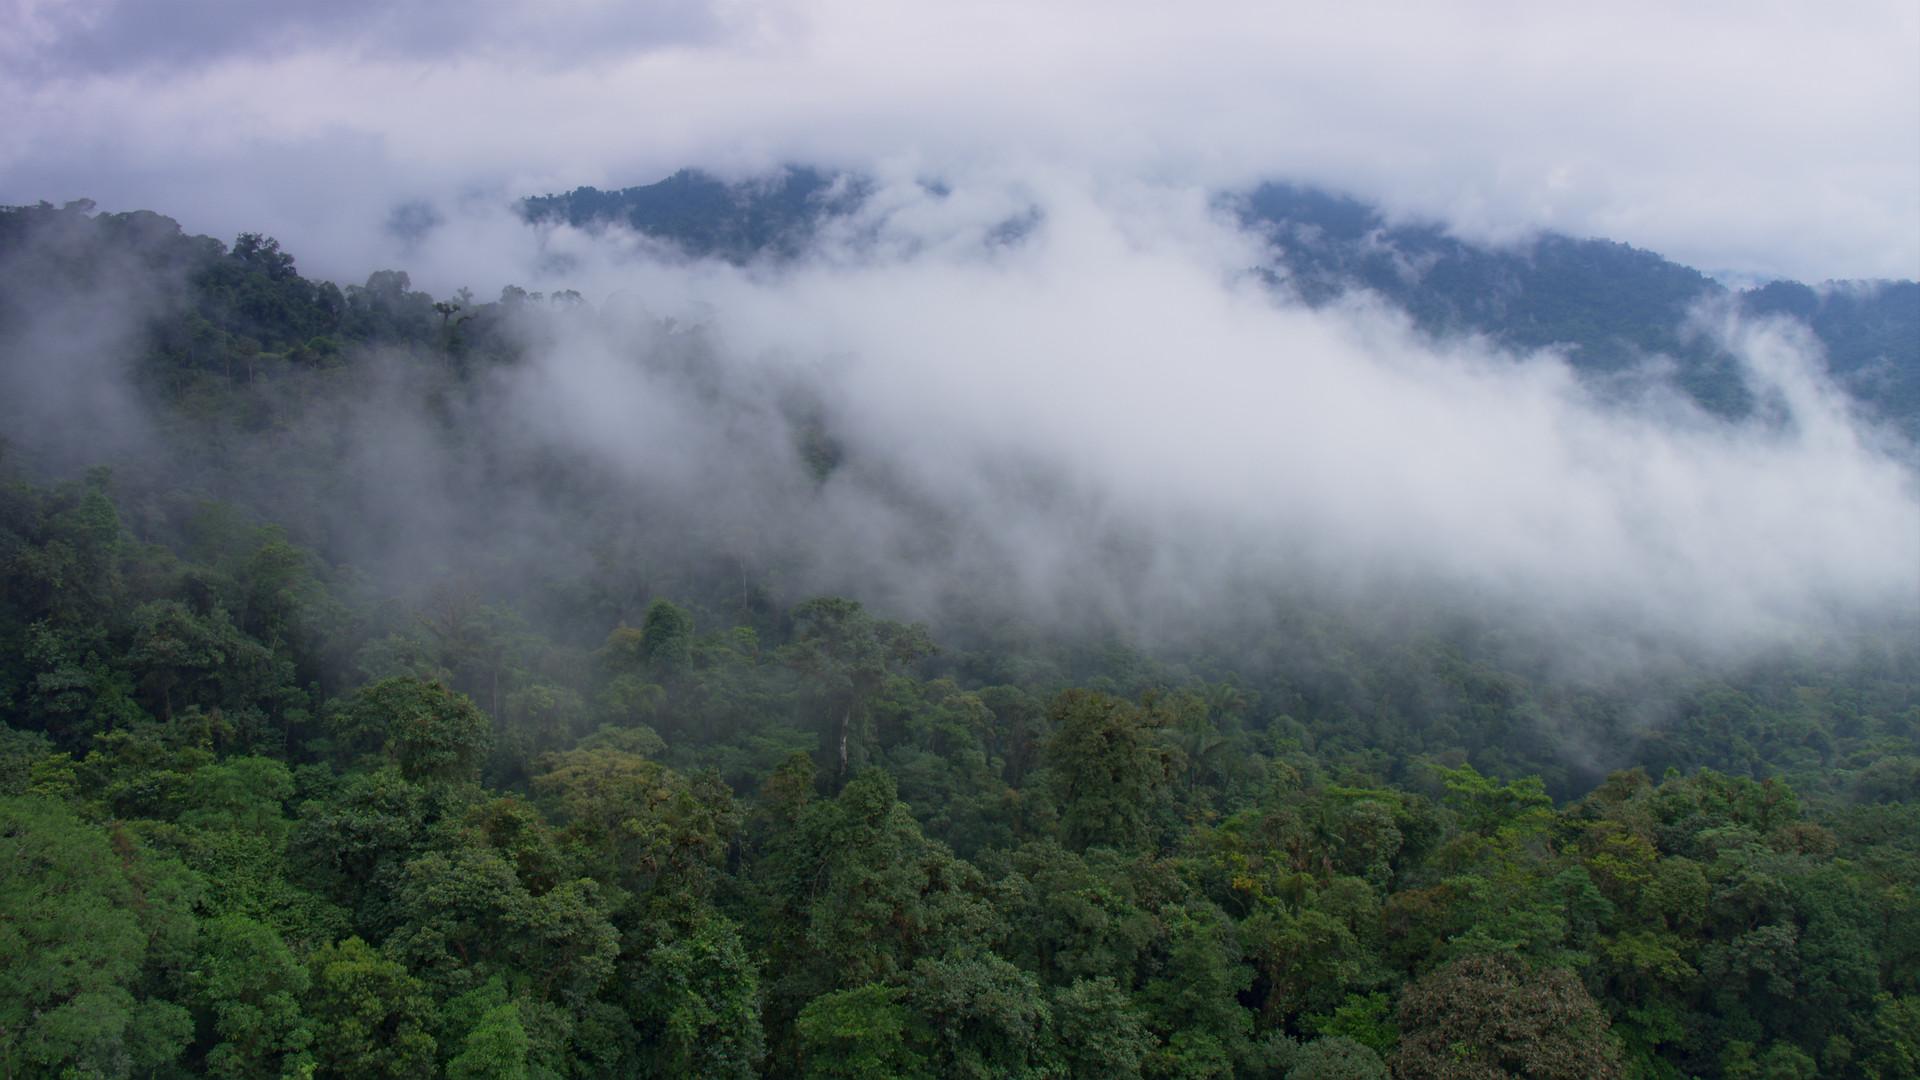 TWA_Ep1_22_cloudforest.jpg